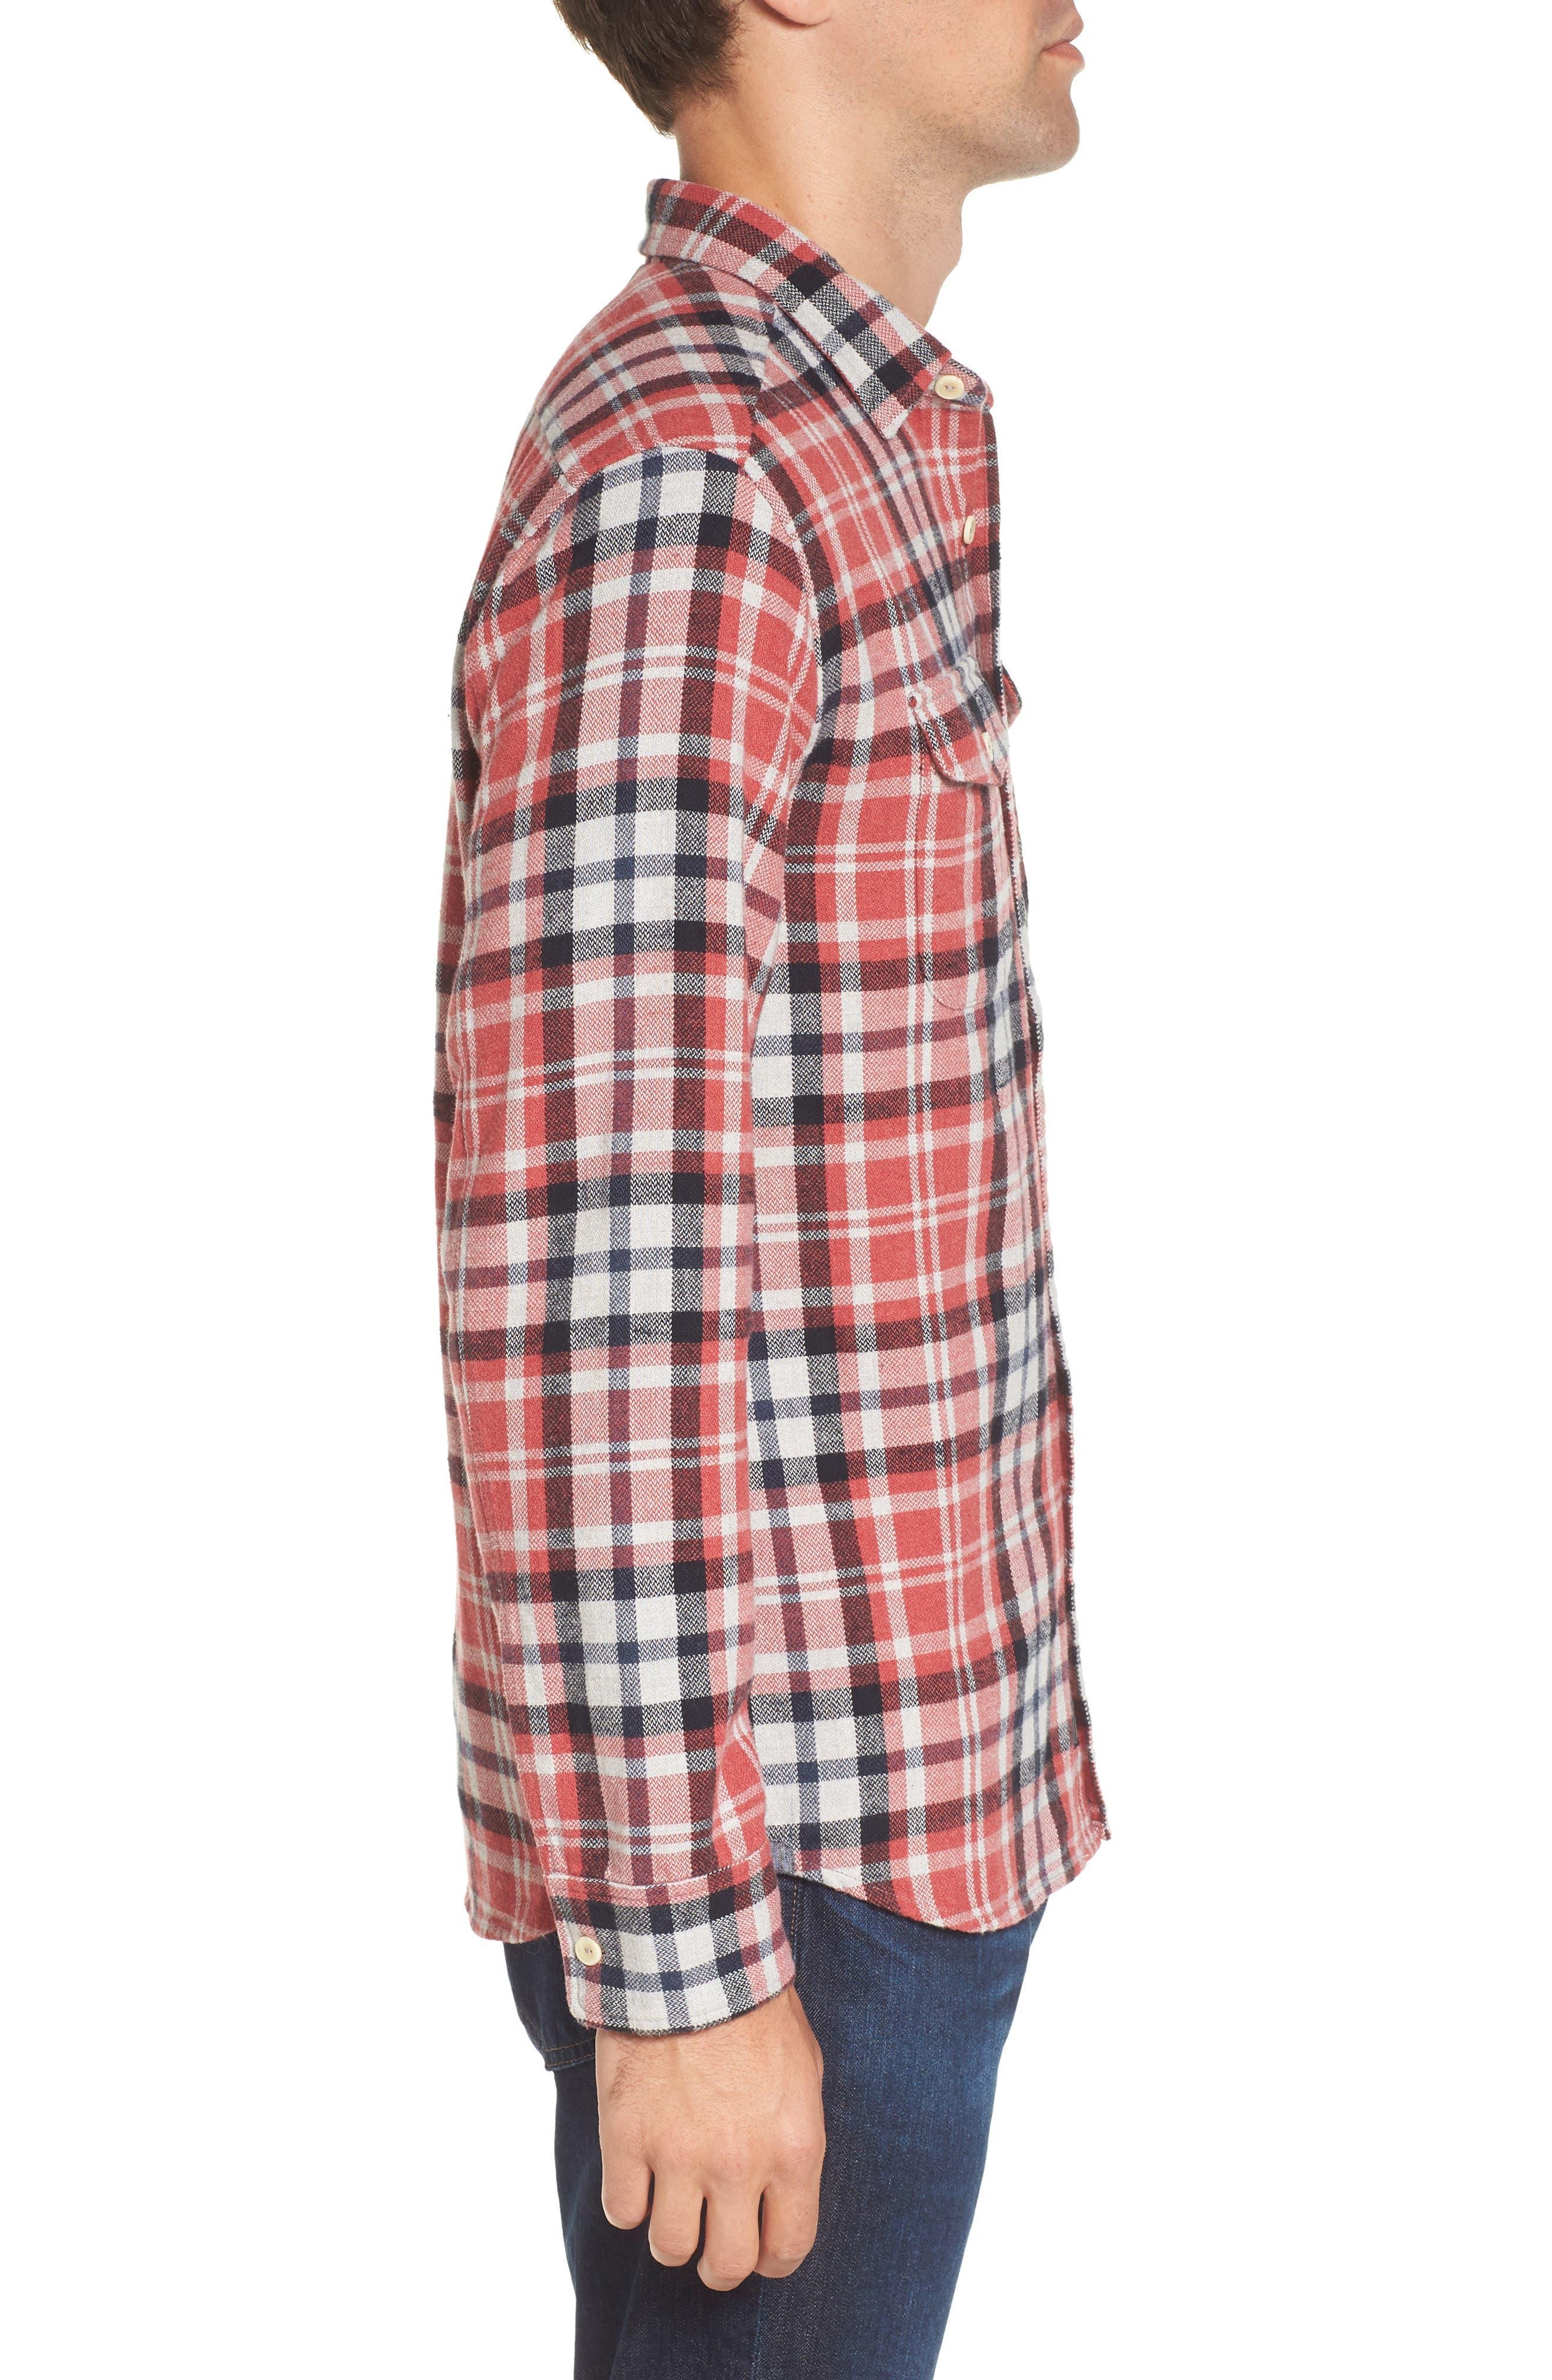 Brampton Textured Plaid Flannel Shirt,                             Alternate thumbnail 3, color,                             Red Stone Navy